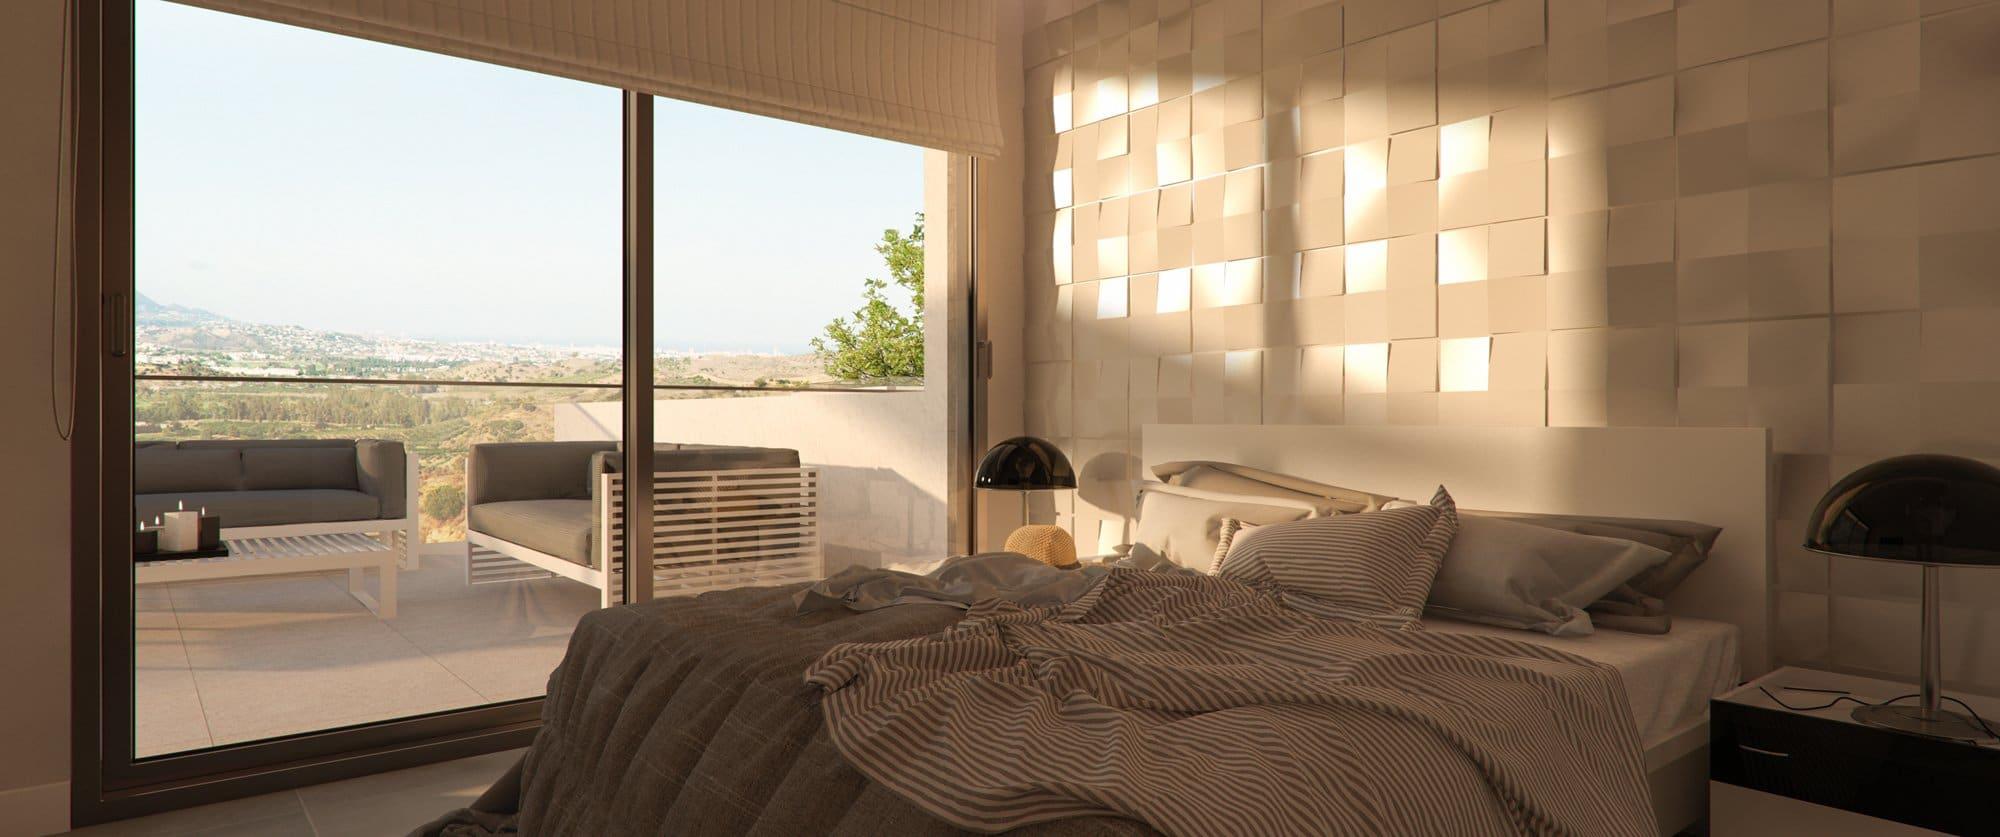 Render interior bedroom by GAYARRE infografia